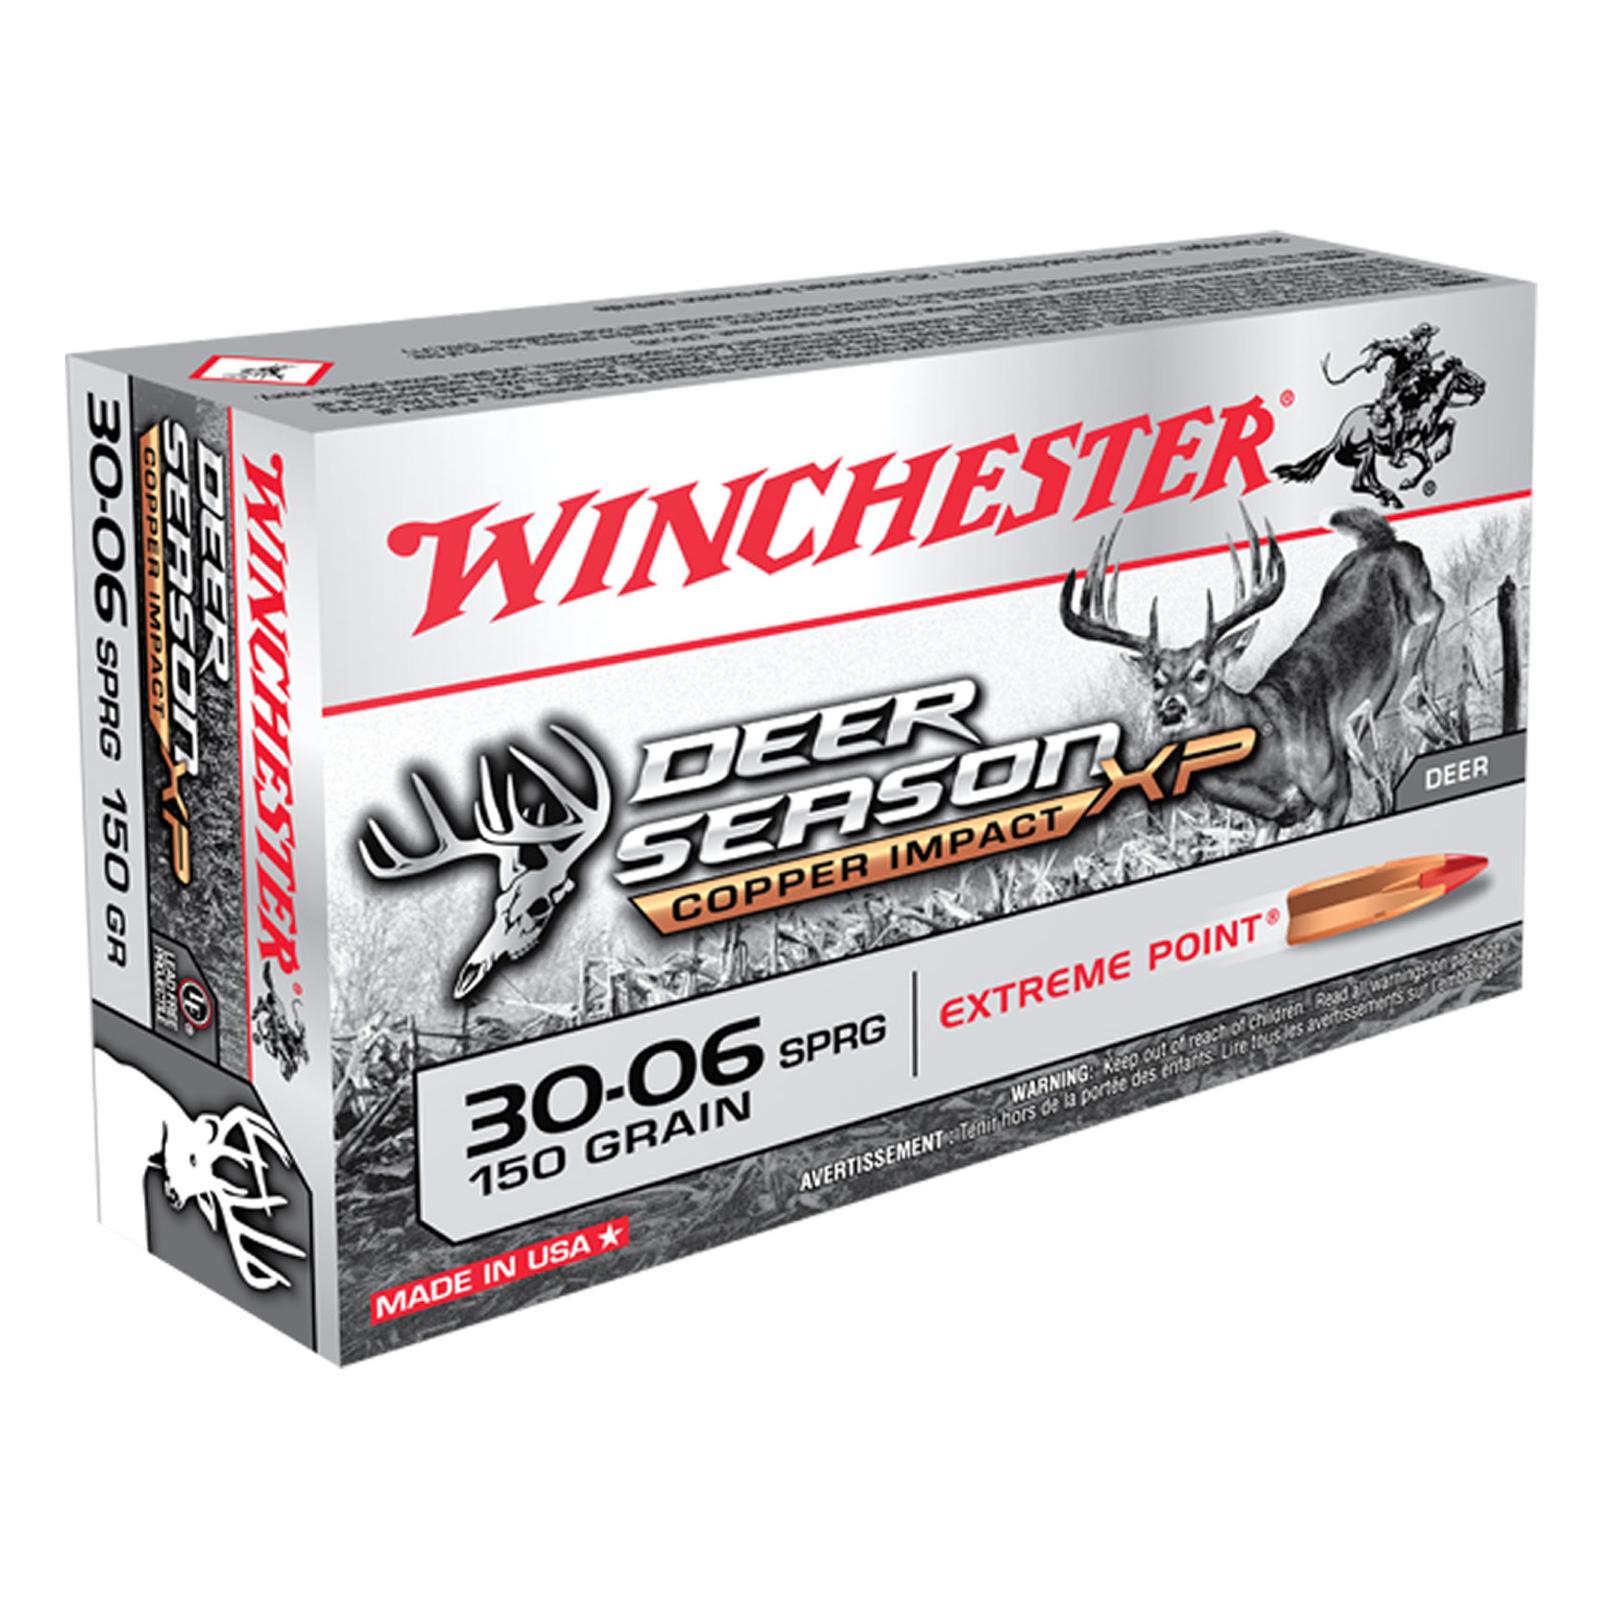 Winchester Deer Season XP Copper Impact Rifle Ammunition, .30-06 Spring, 150-gr.